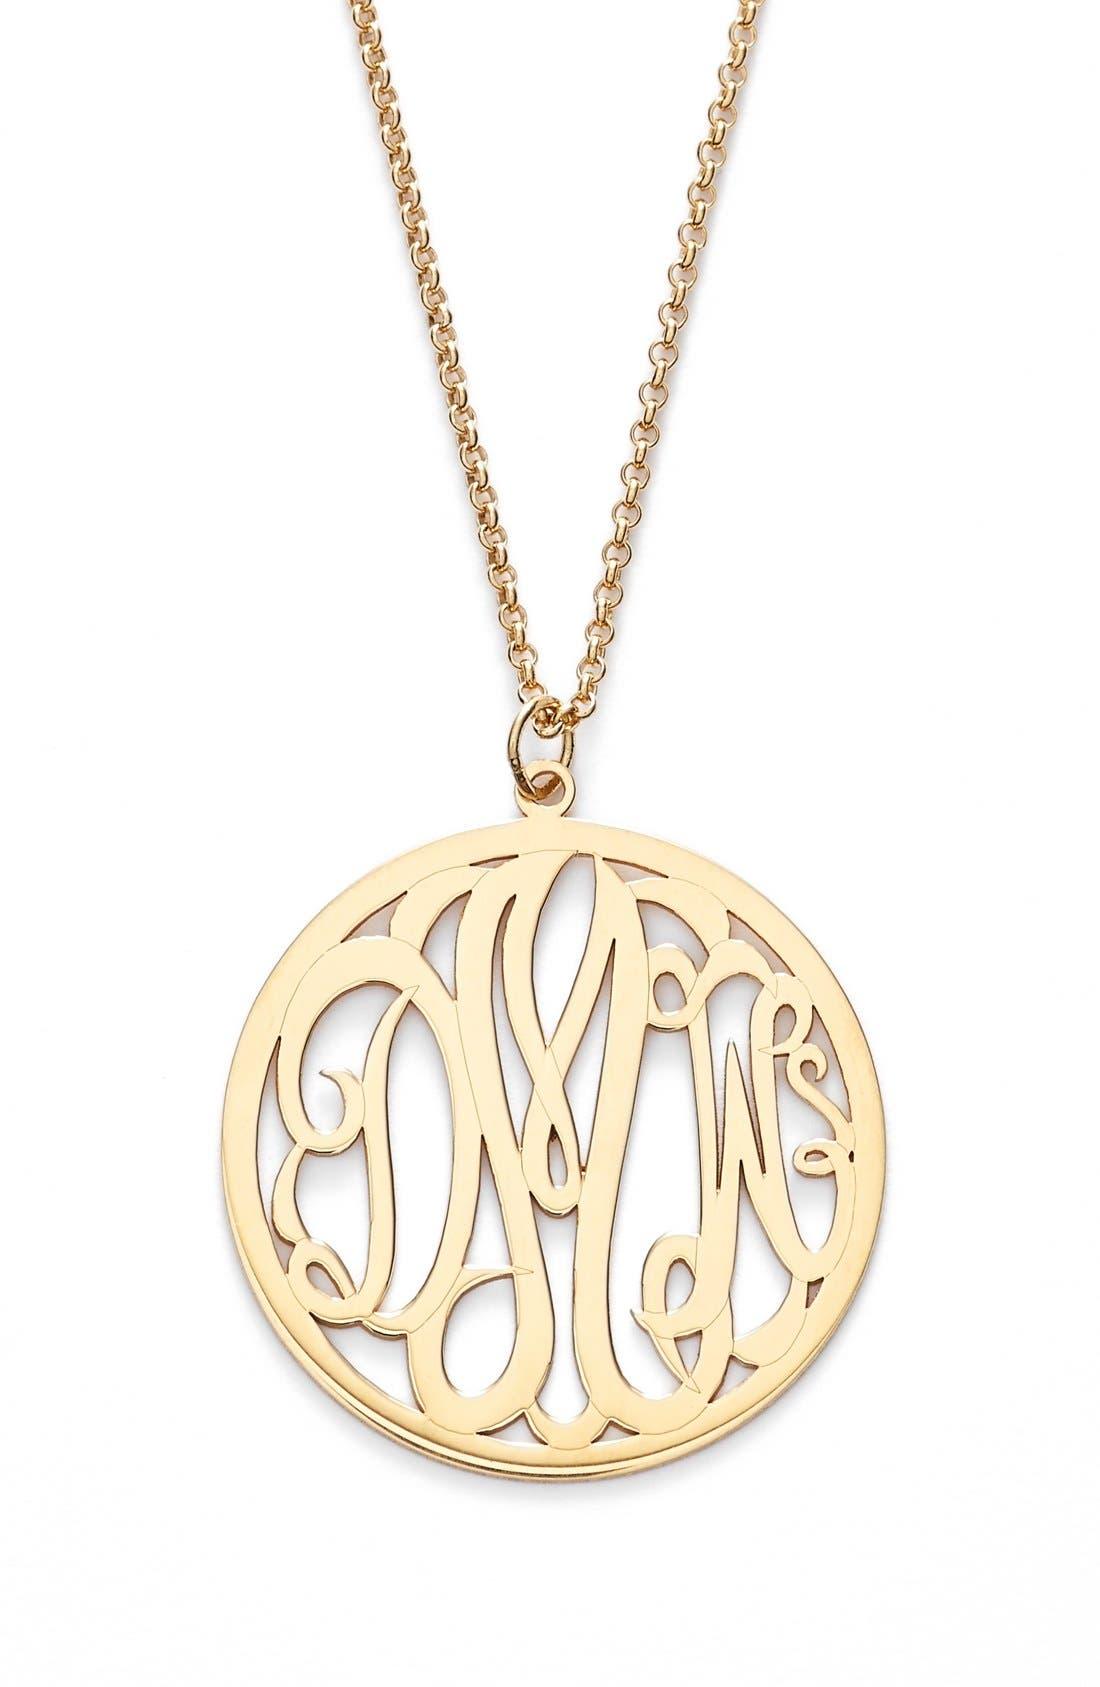 Personalized 3-Letter Monogram Necklace,                             Main thumbnail 1, color,                             GOLD